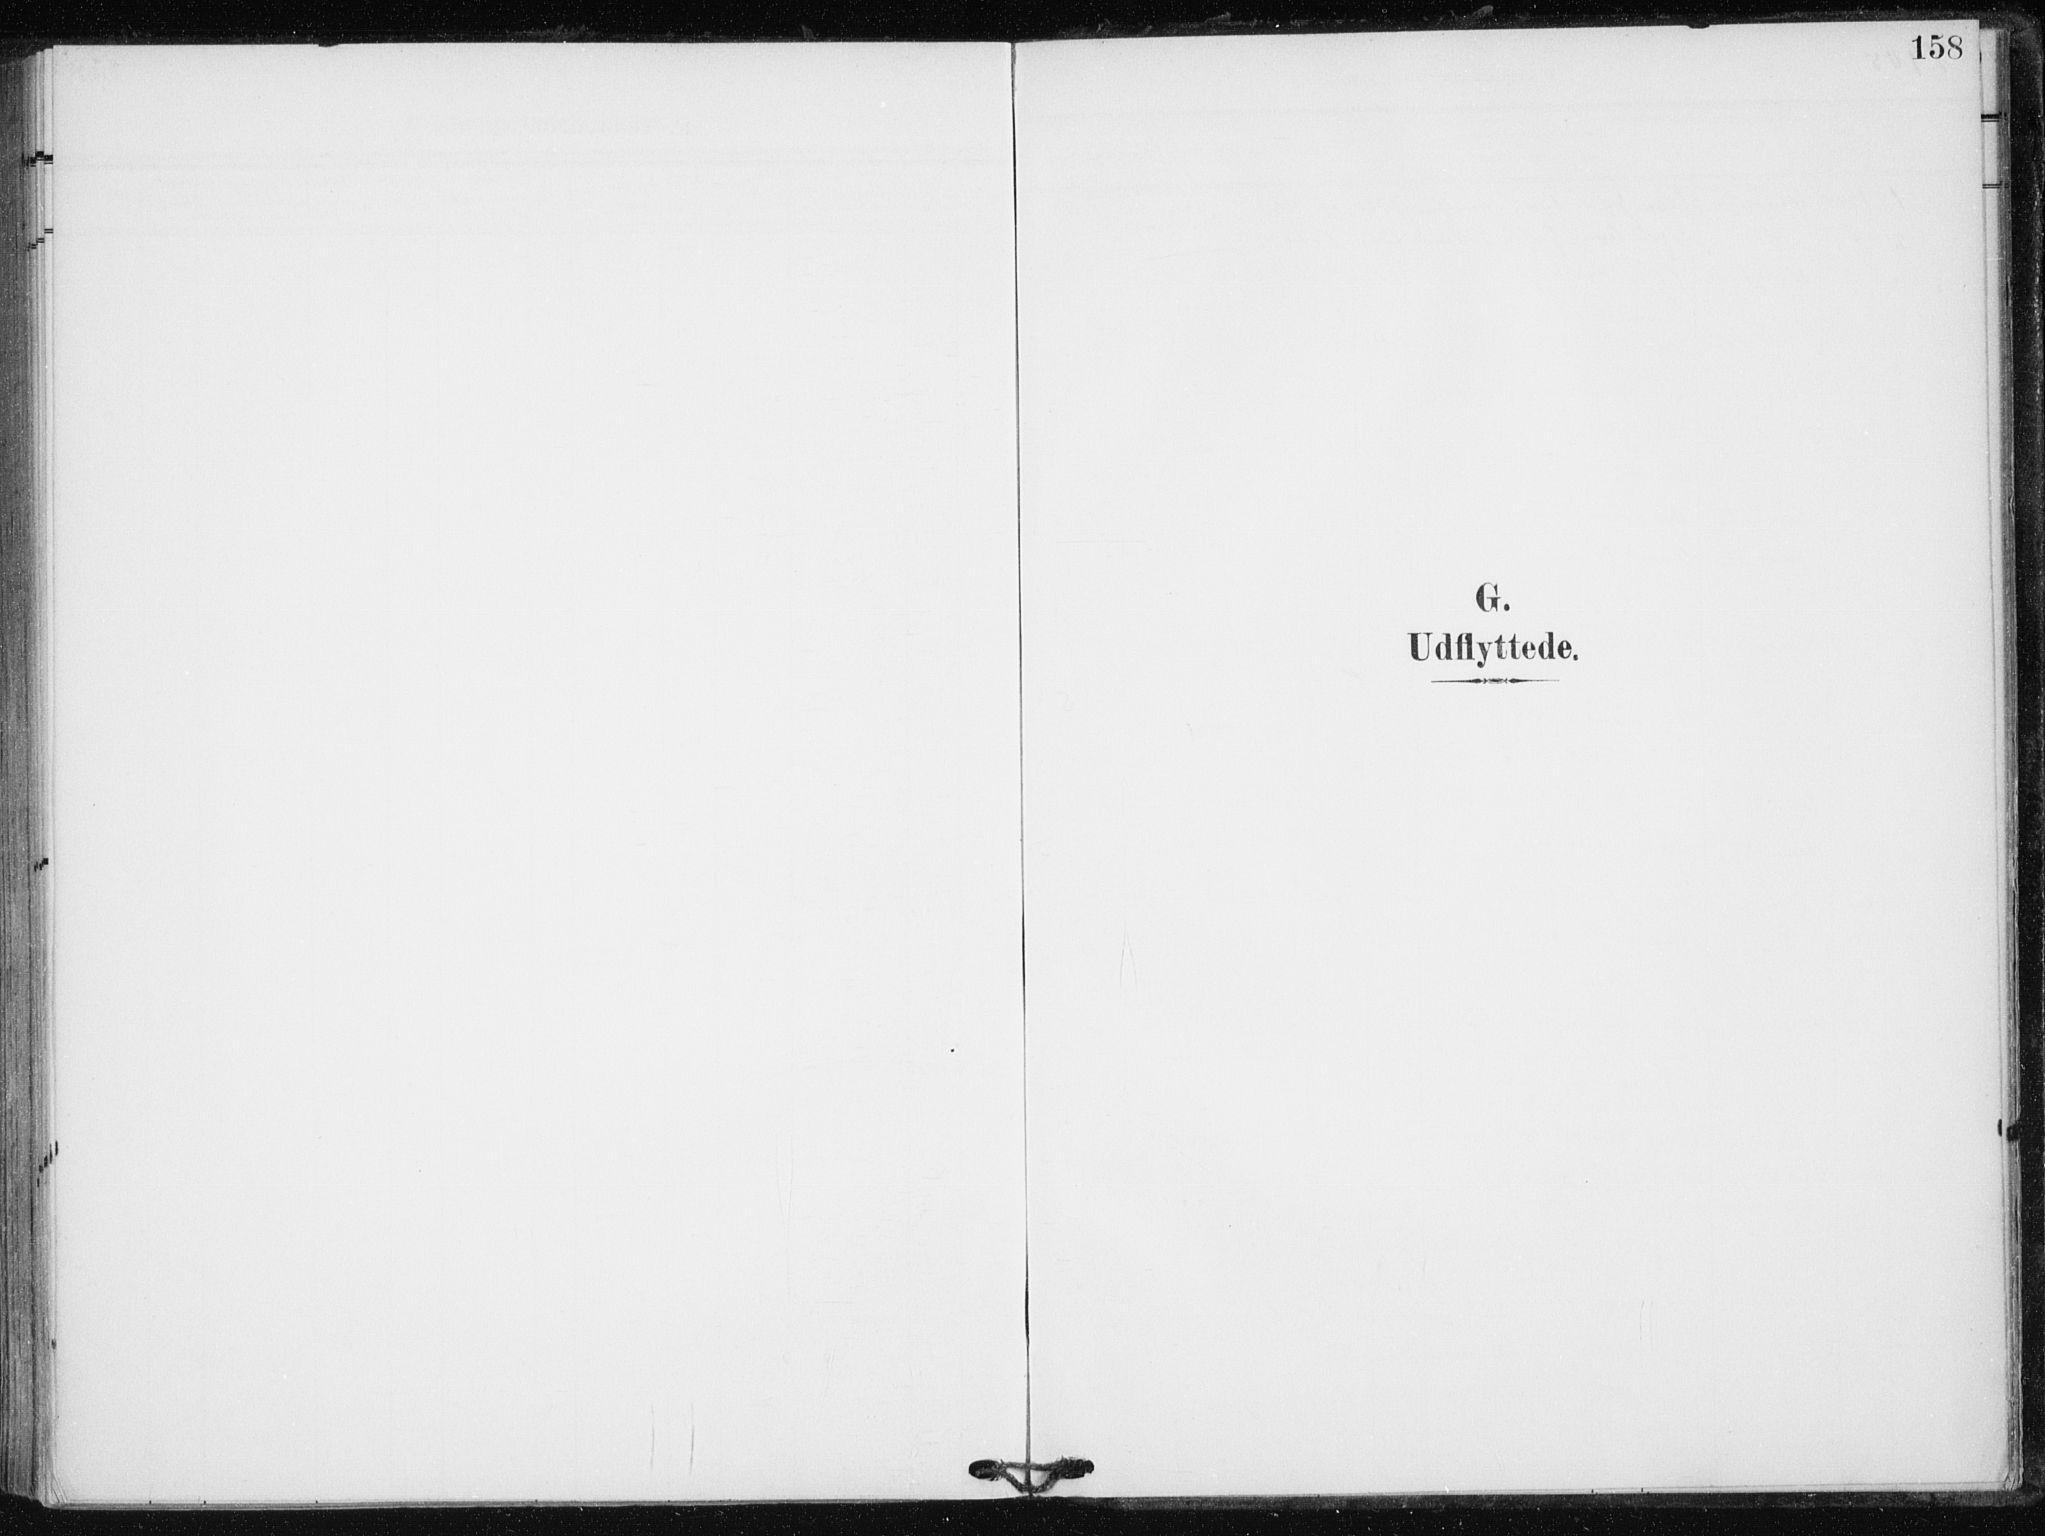 SATØ, Tranøy sokneprestkontor, I/Ia/Iaa/L0013kirke: Ministerialbok nr. 13, 1905-1922, s. 158